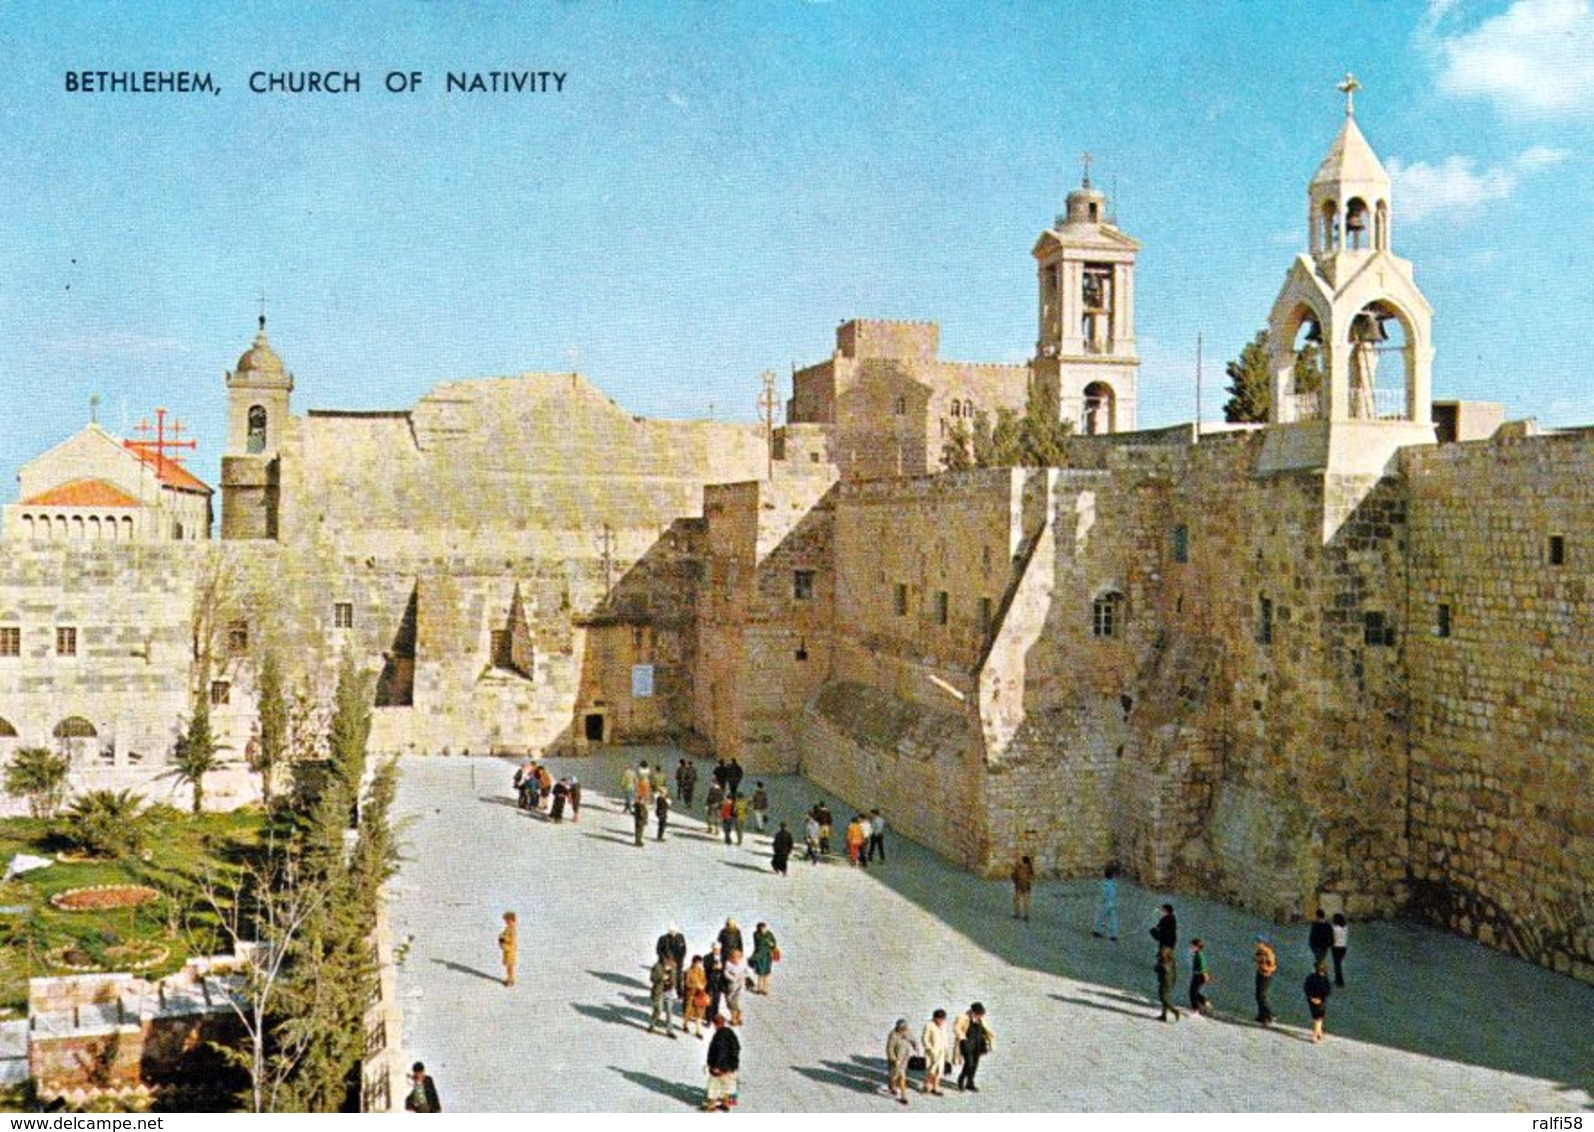 1 AK Palästina * Bethlehem - Church Of Nativity, Die Geburtskirche - Seit 2012 UNESCO Weltkulturerbe * - Palästina